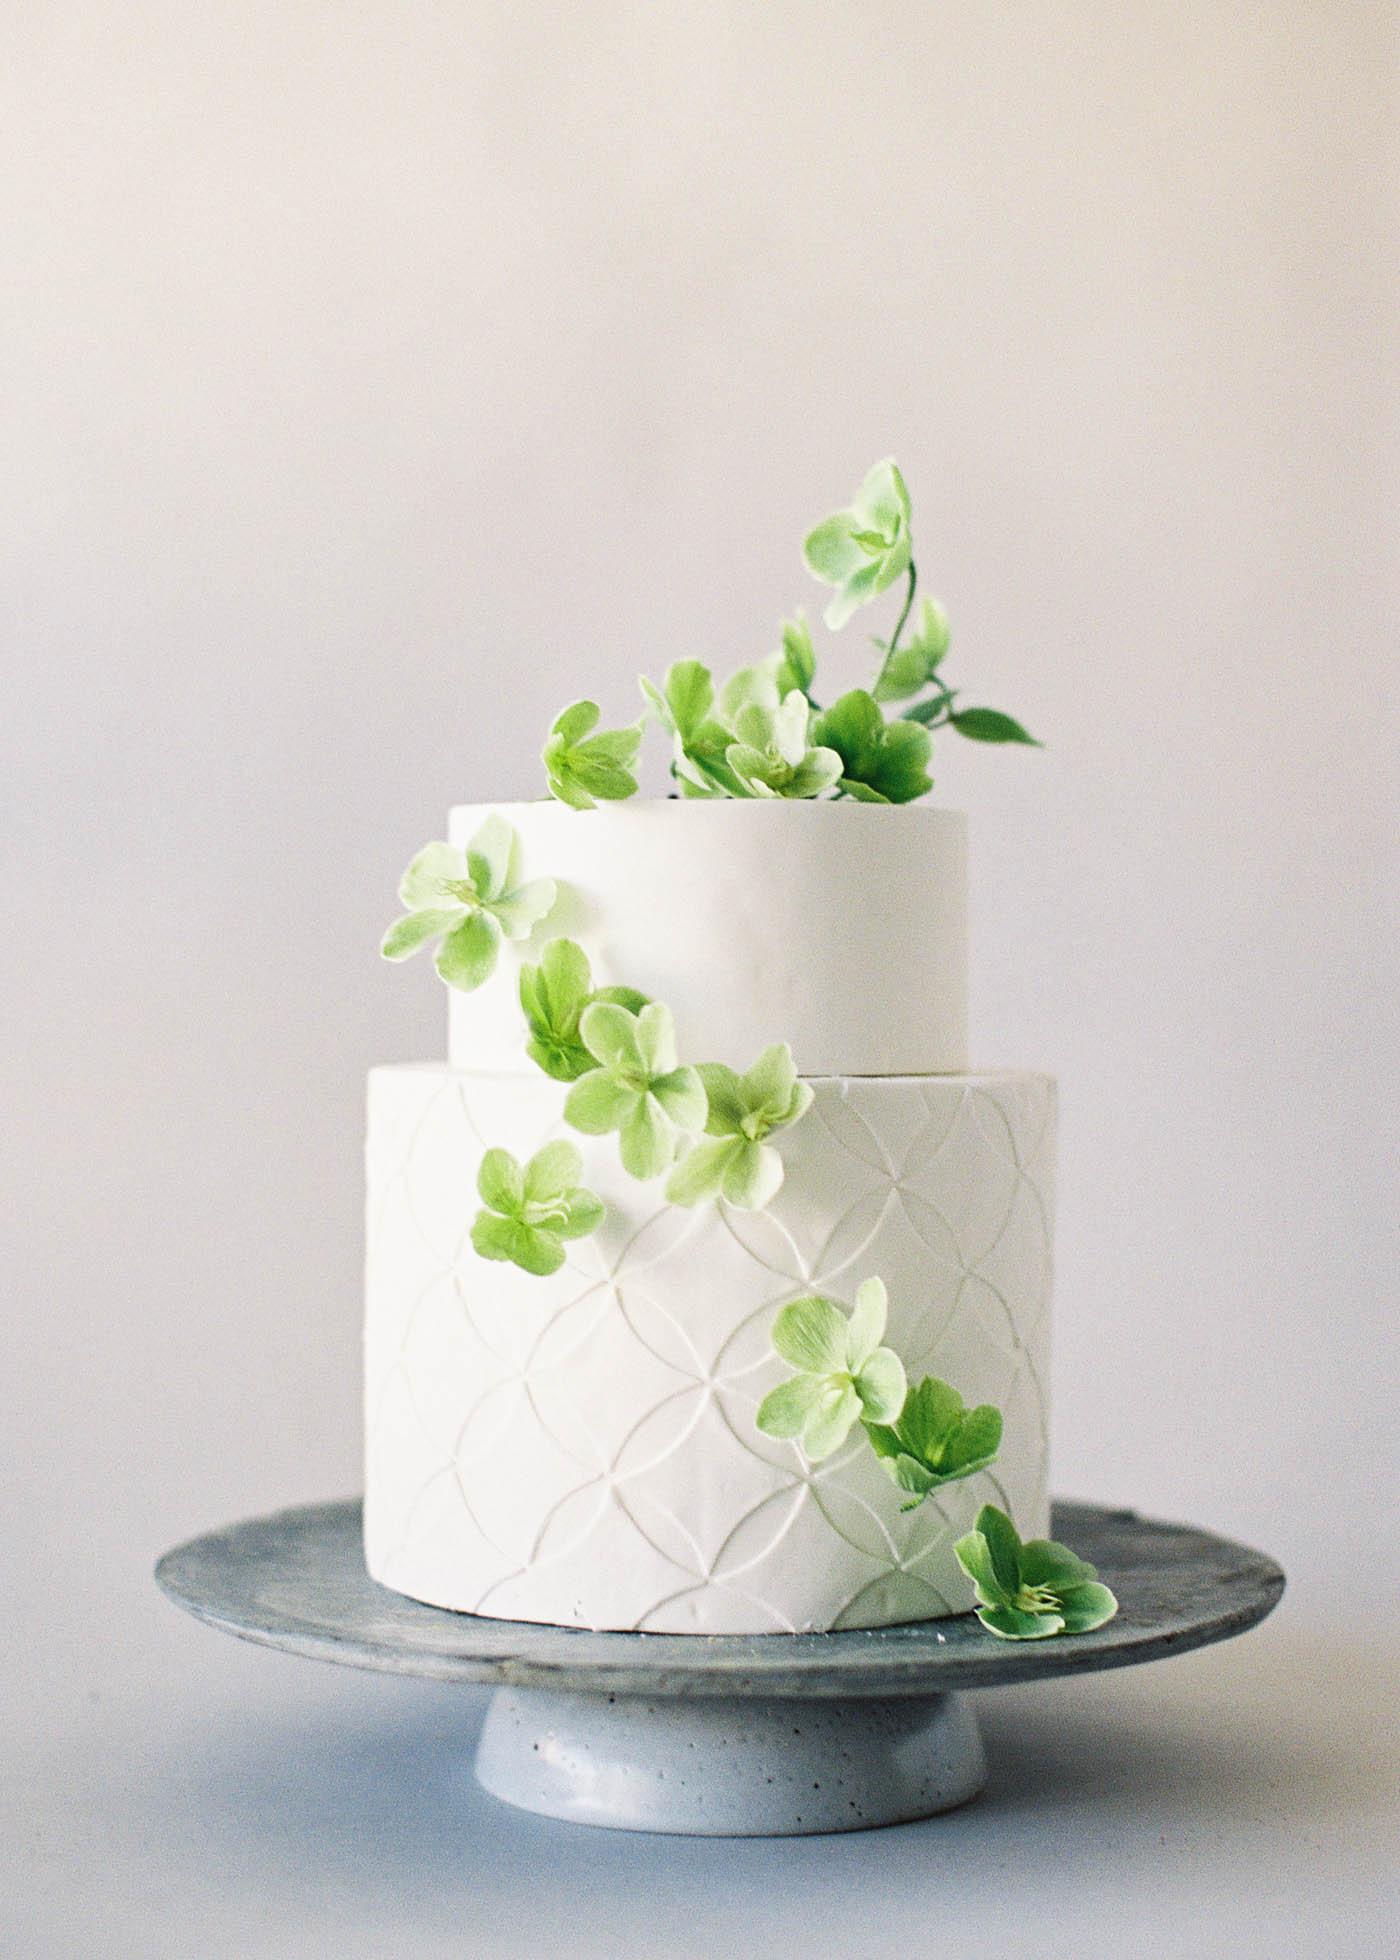 naturalist-cakes-9-Jen_Huang-000486-R1-043-20.jpg